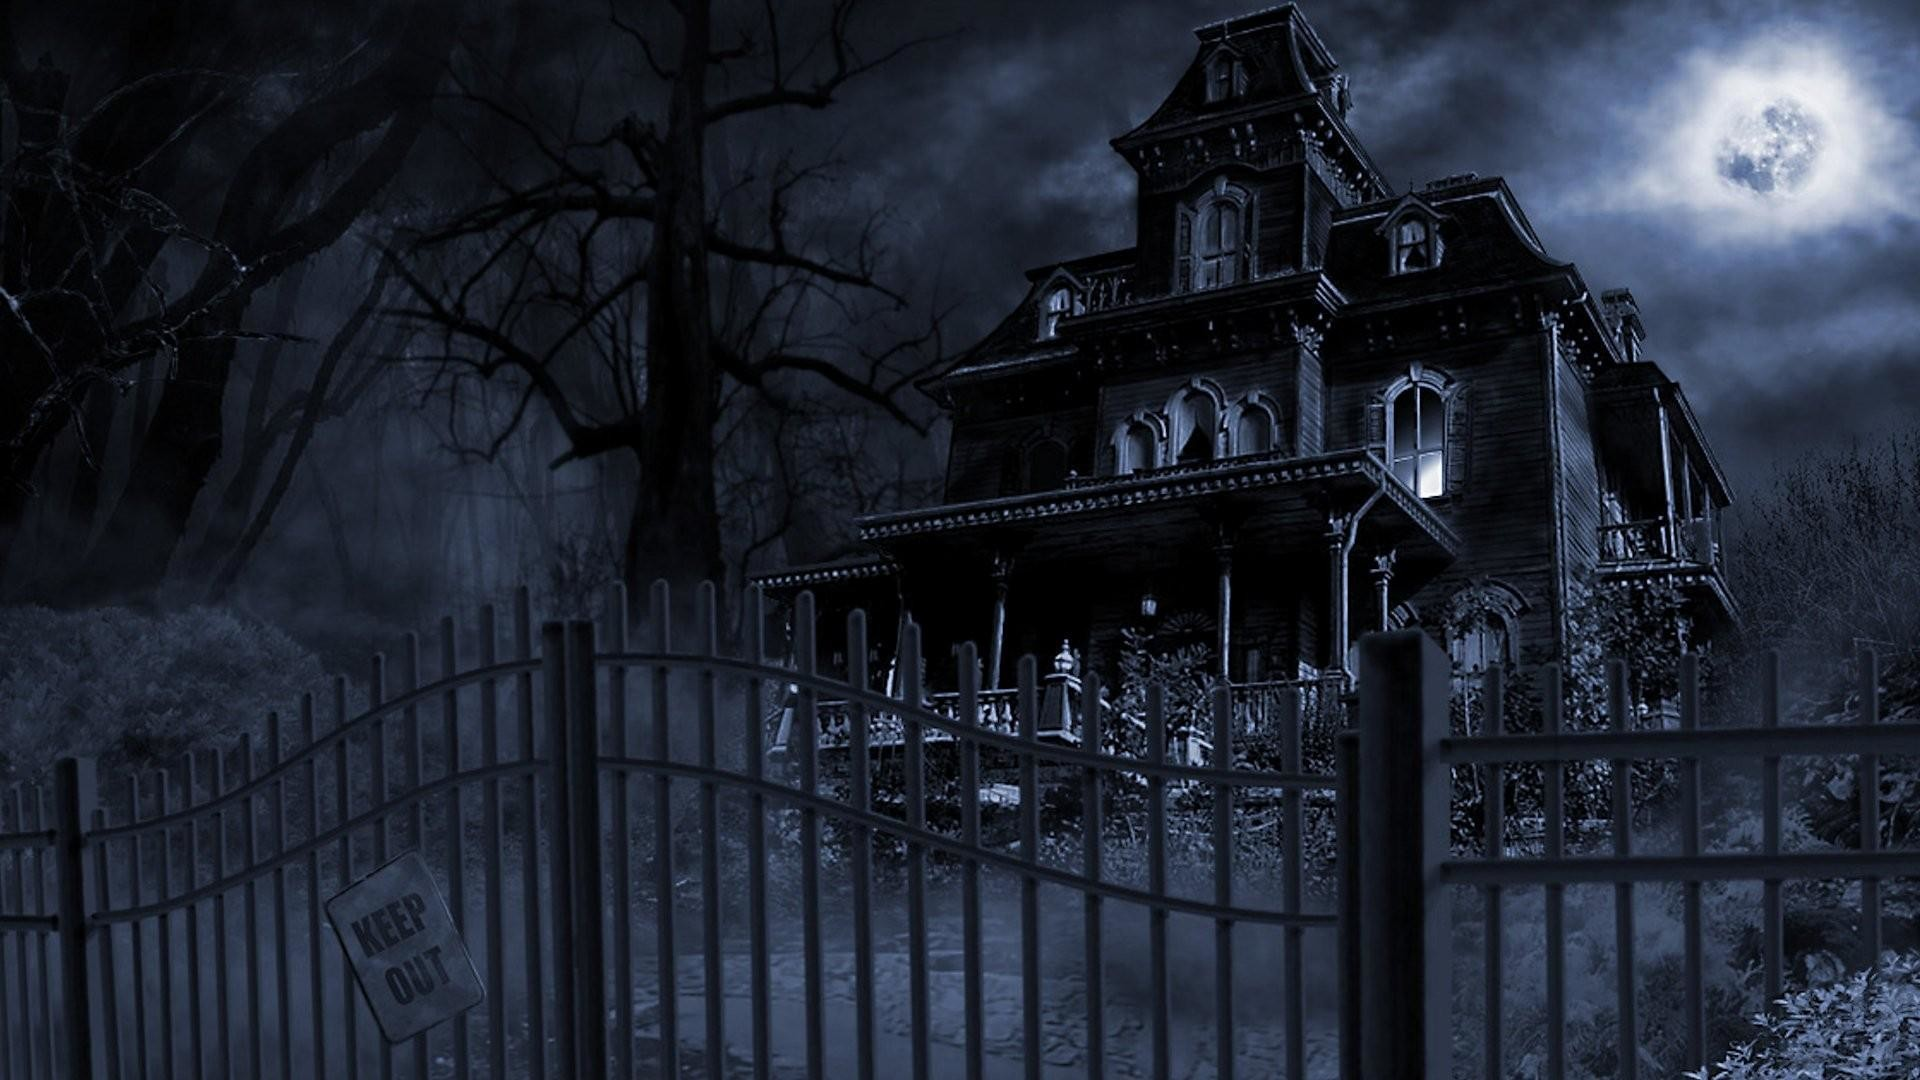 Halloween-Haunted-House-Wallpapers